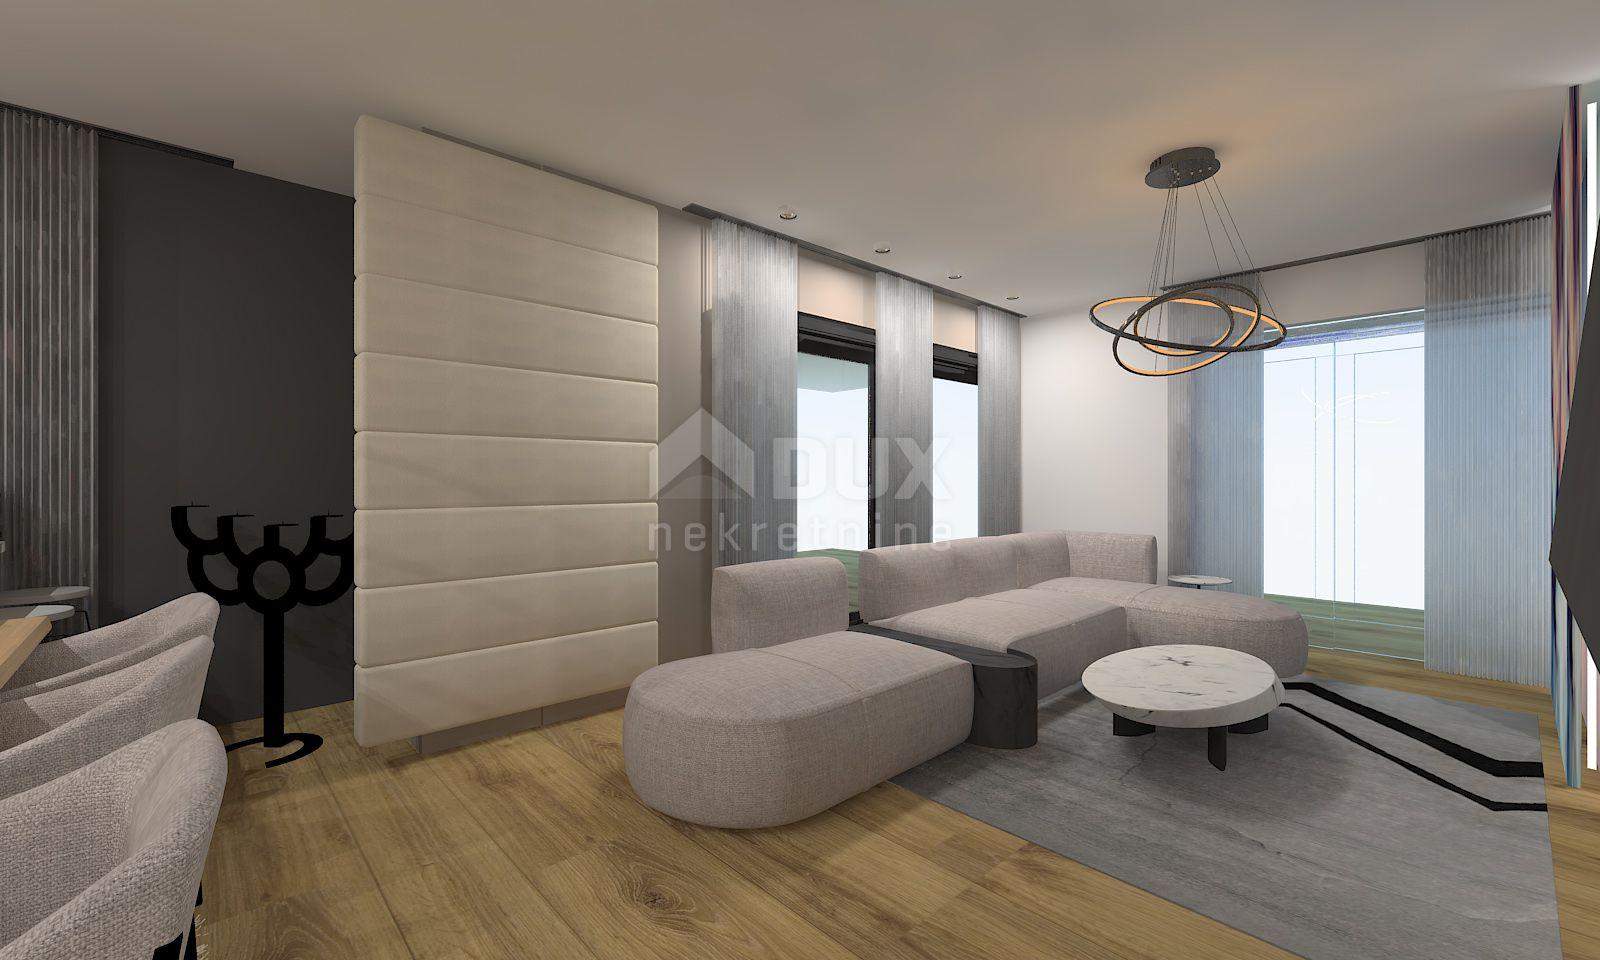 Apartment Doričići, Kostrena, 146m2